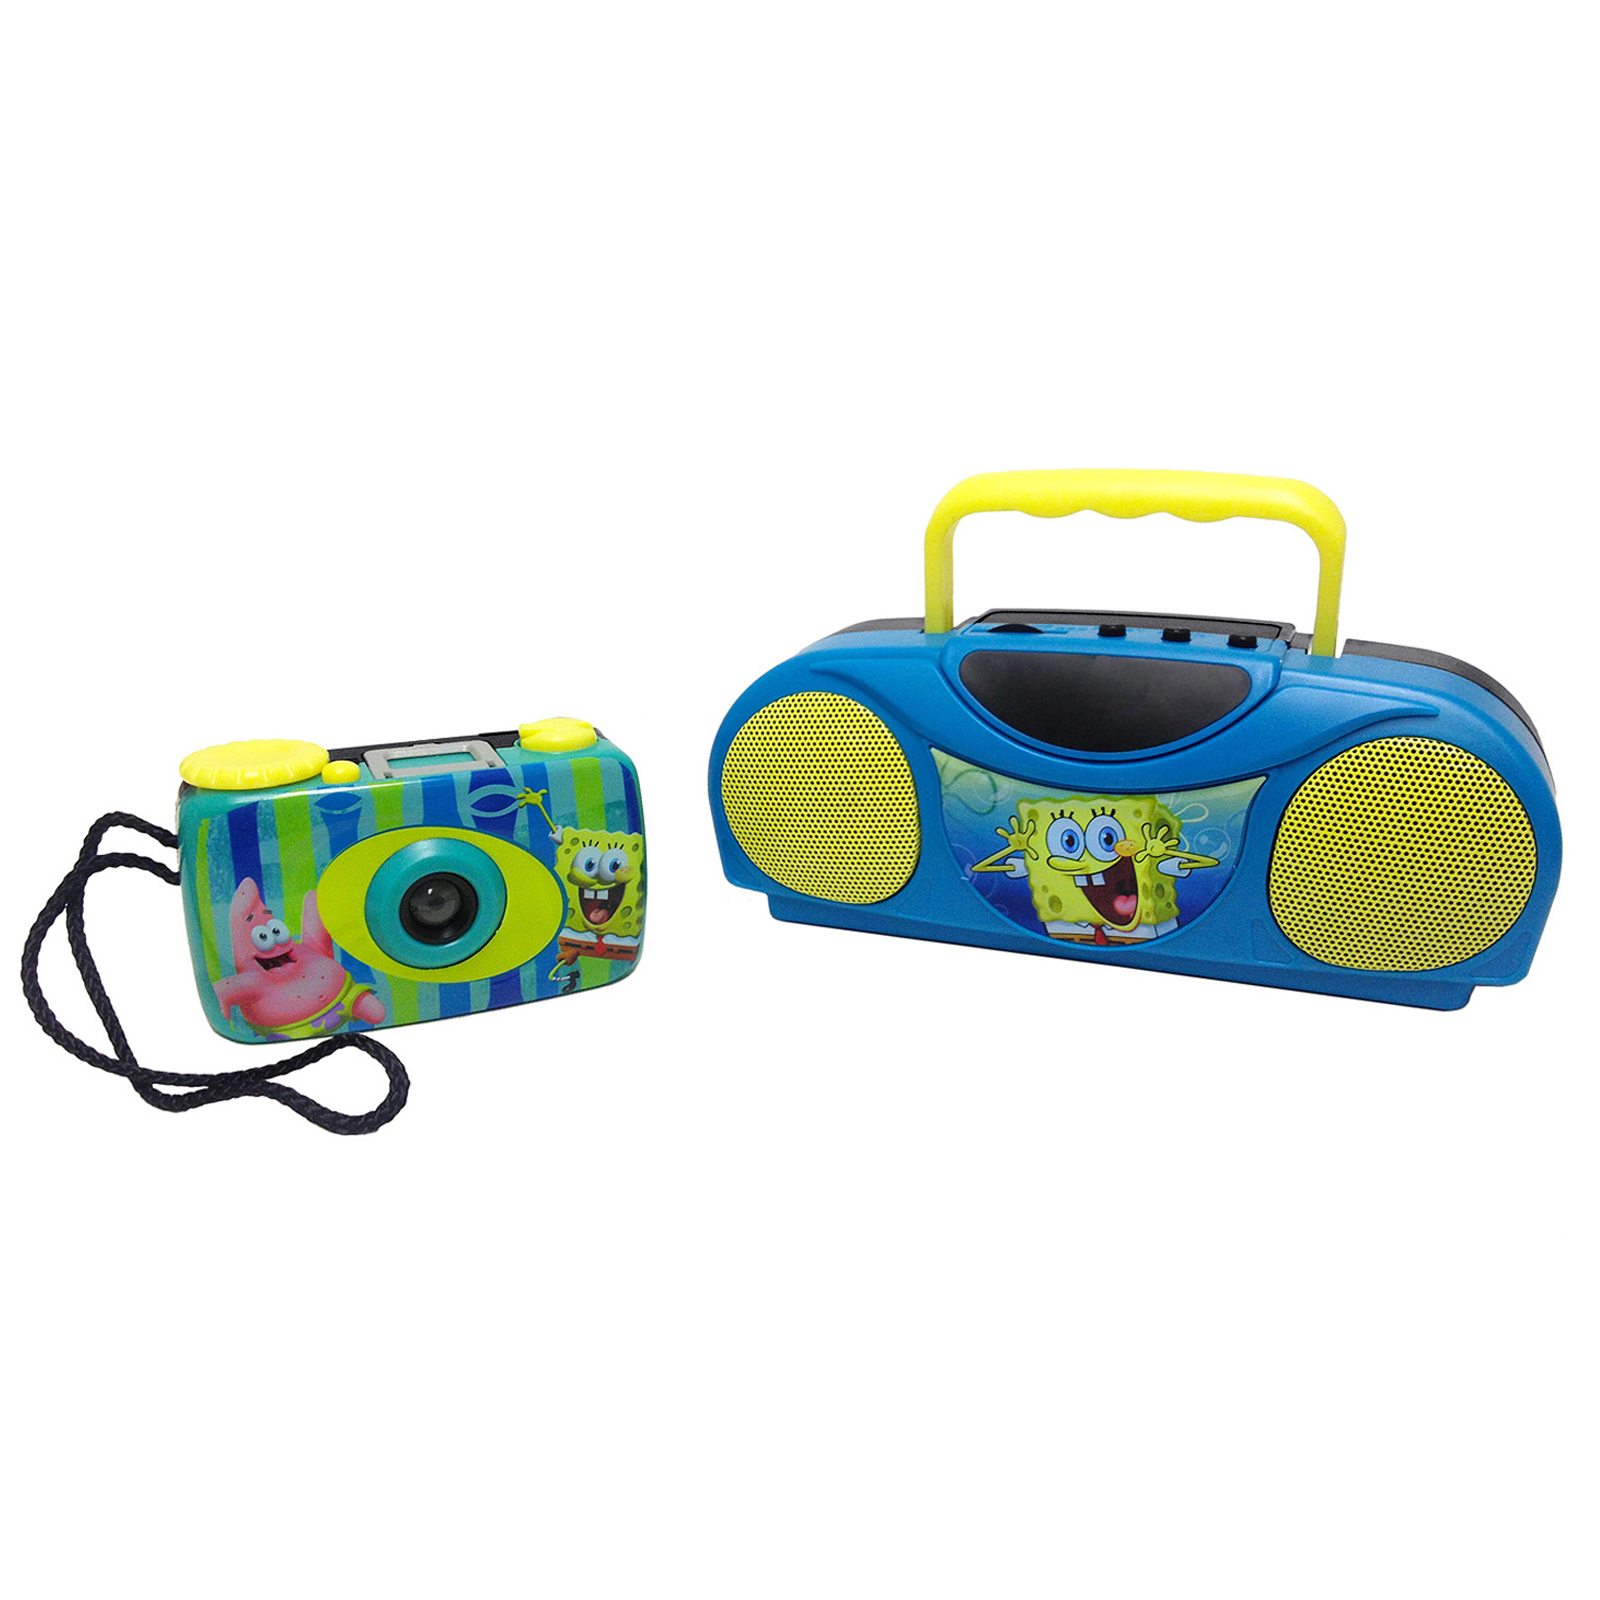 SpongeBob Squarepants Camera and Radio Kit - Walmart.com